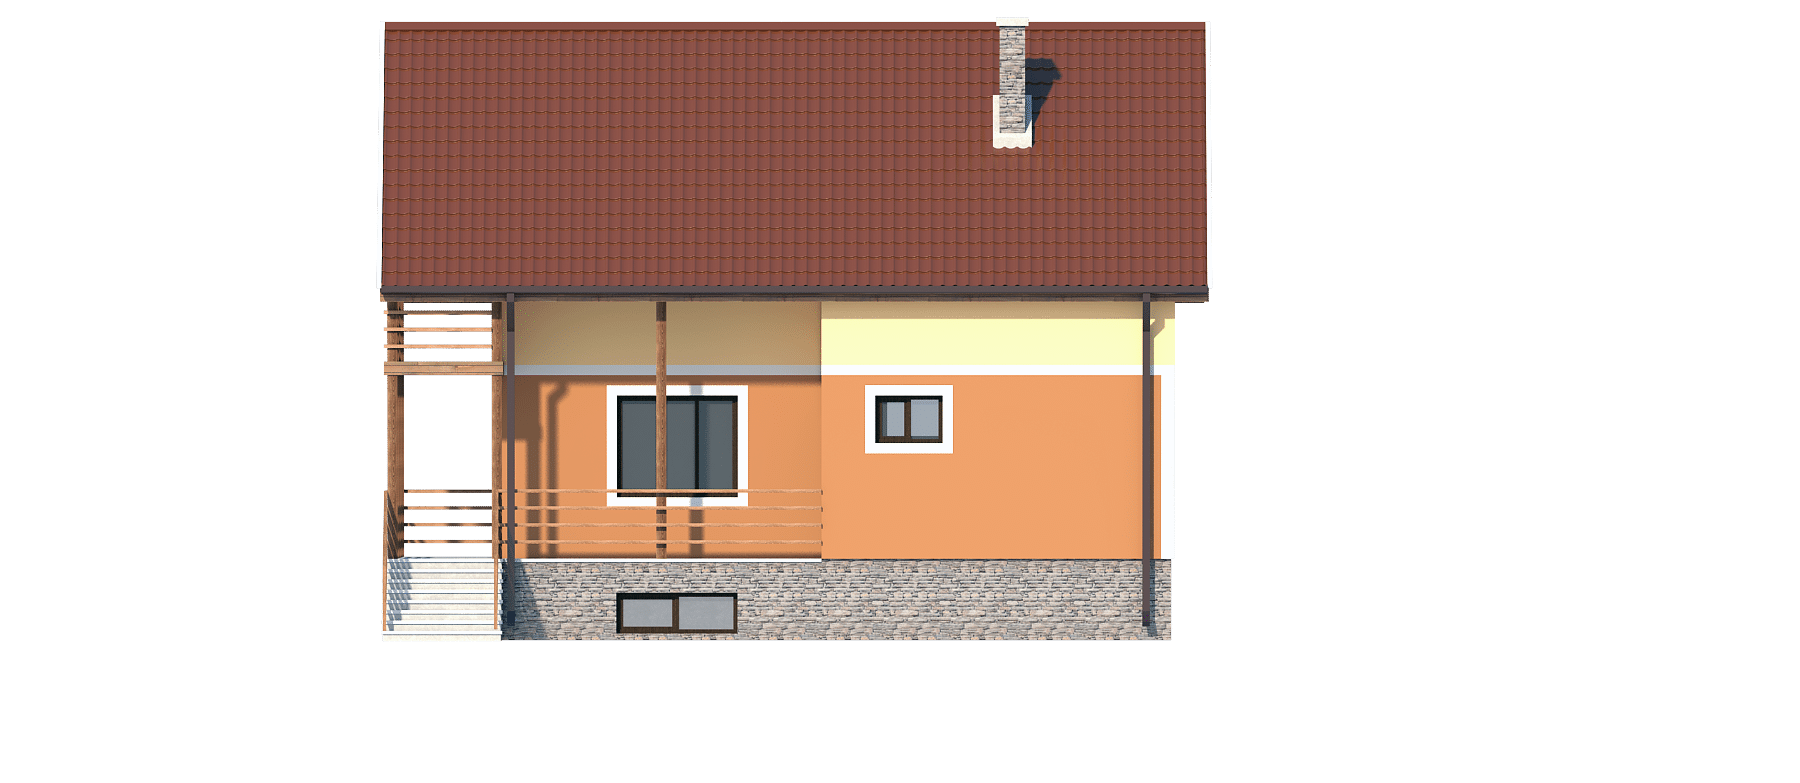 Фасад мансардного дома с террасой «КМ-1» - справа